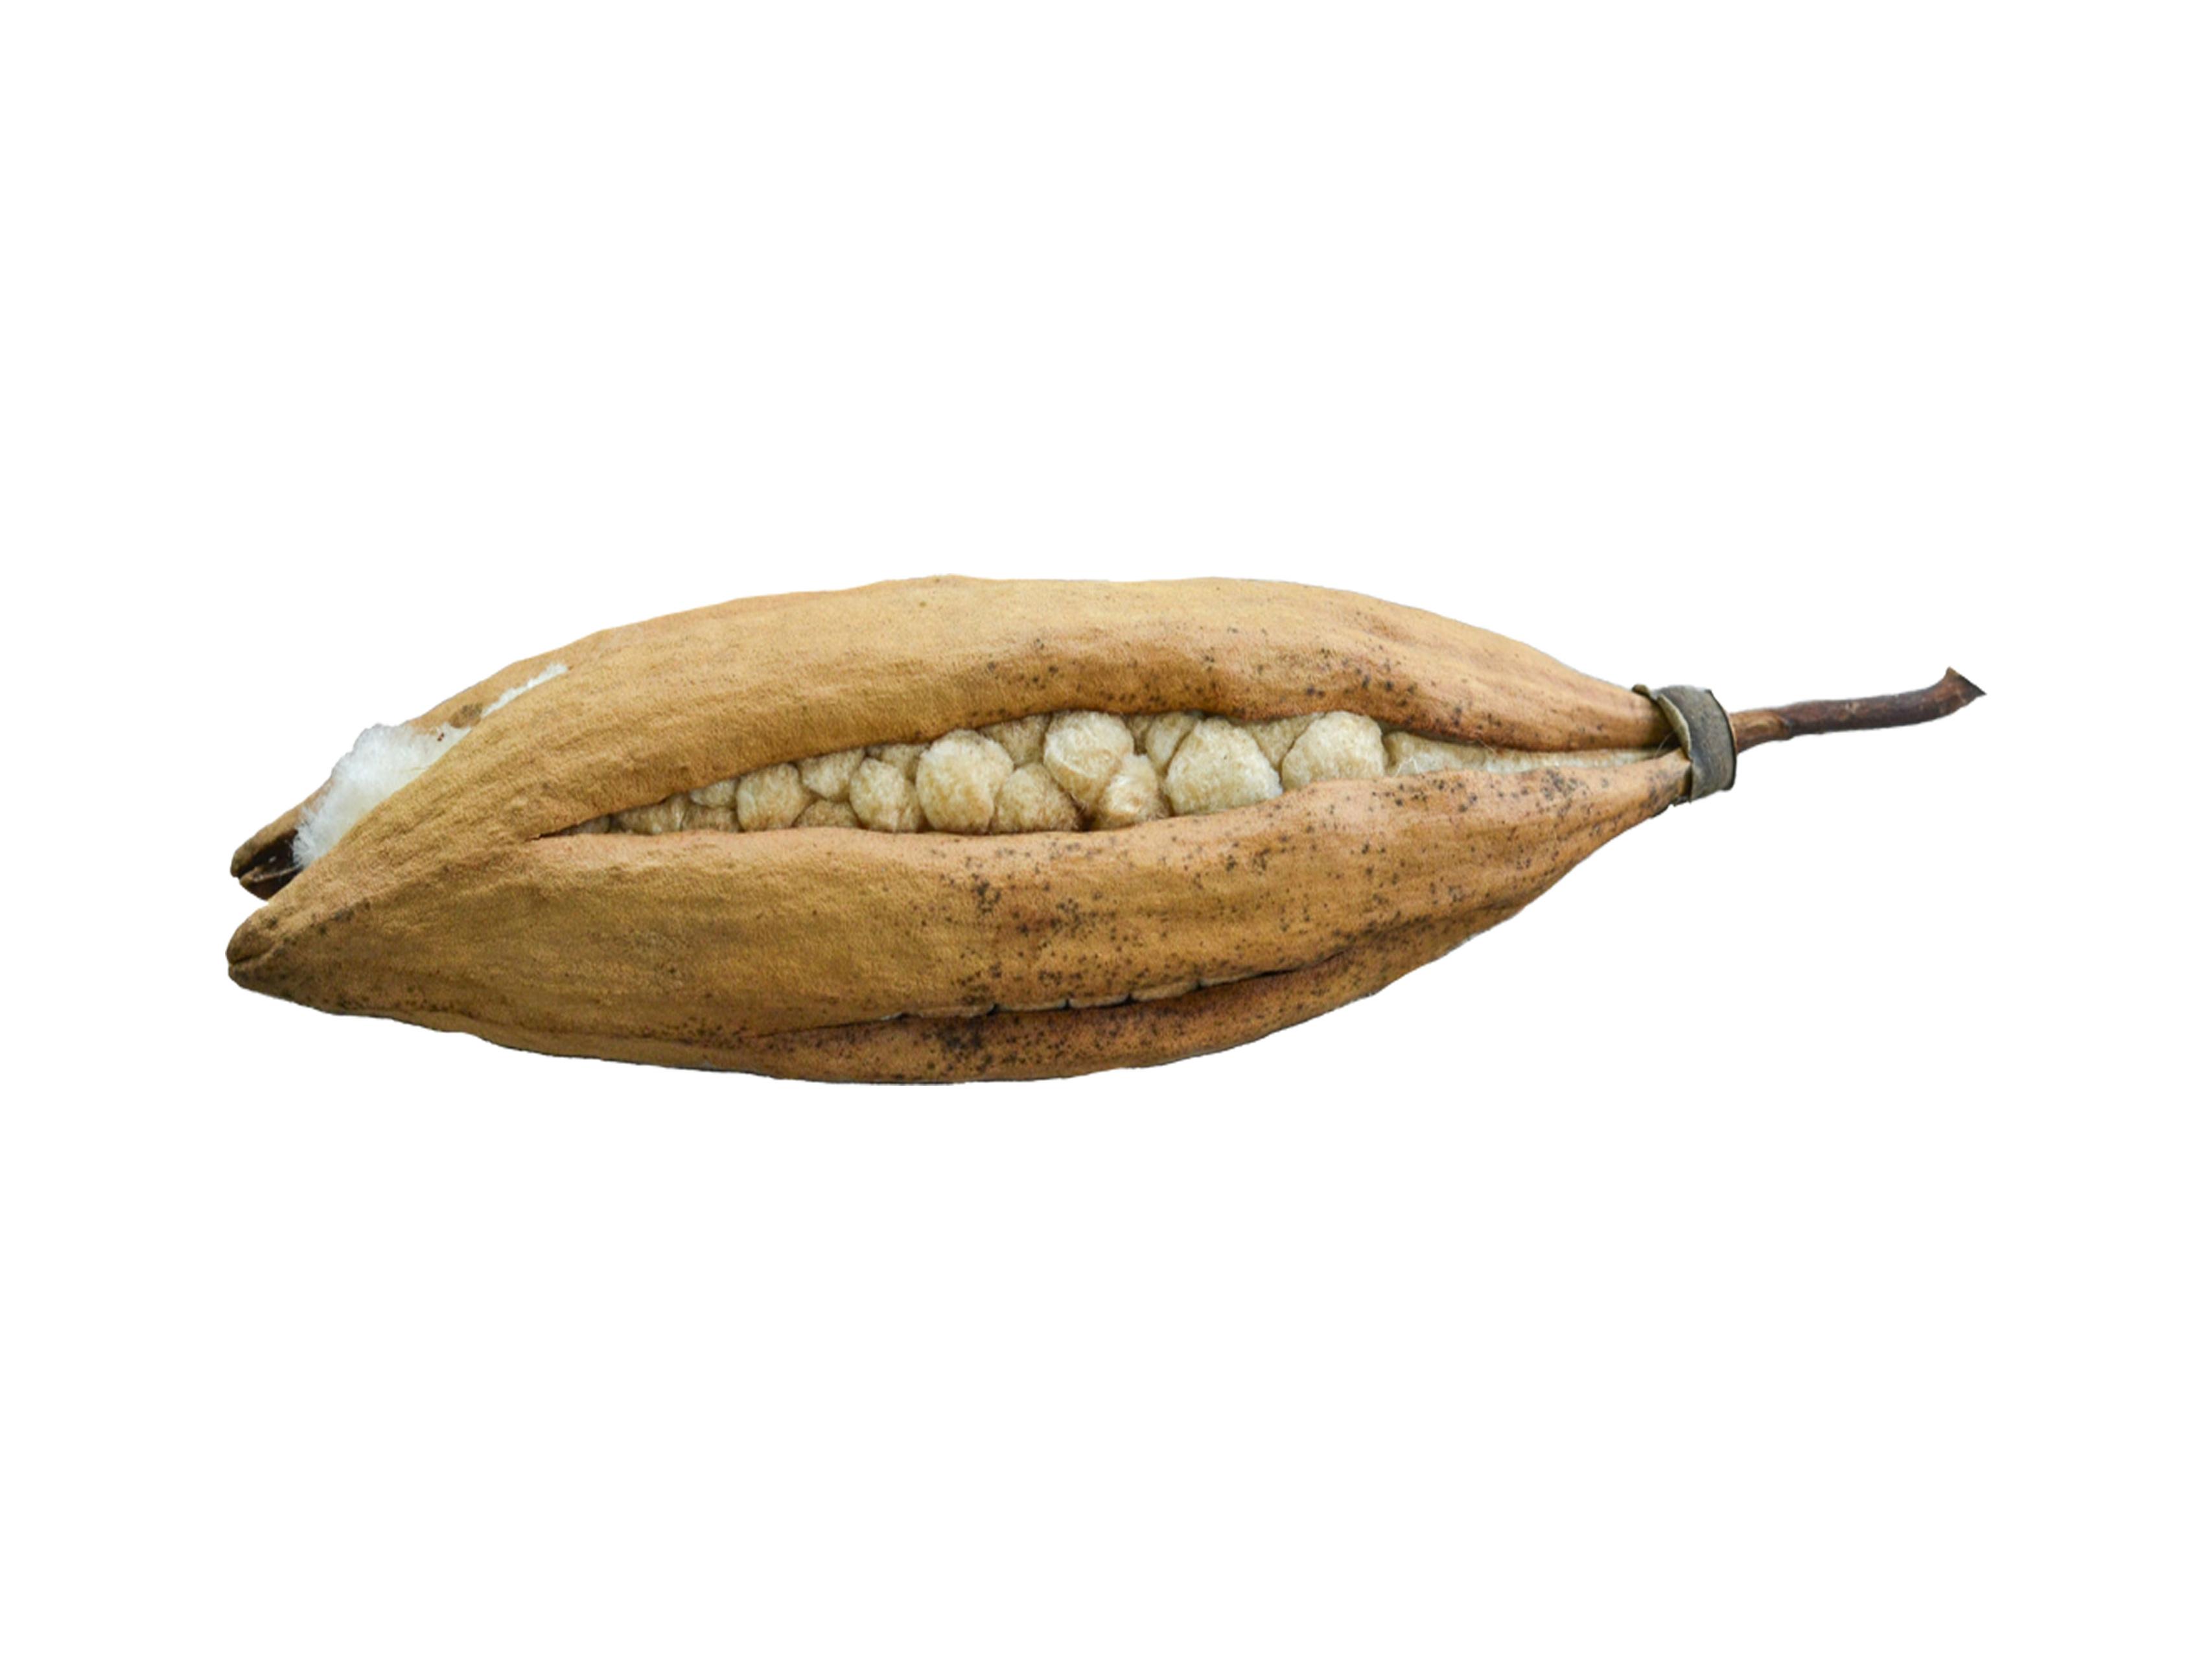 Kapok Pod Dried Plant Specimen